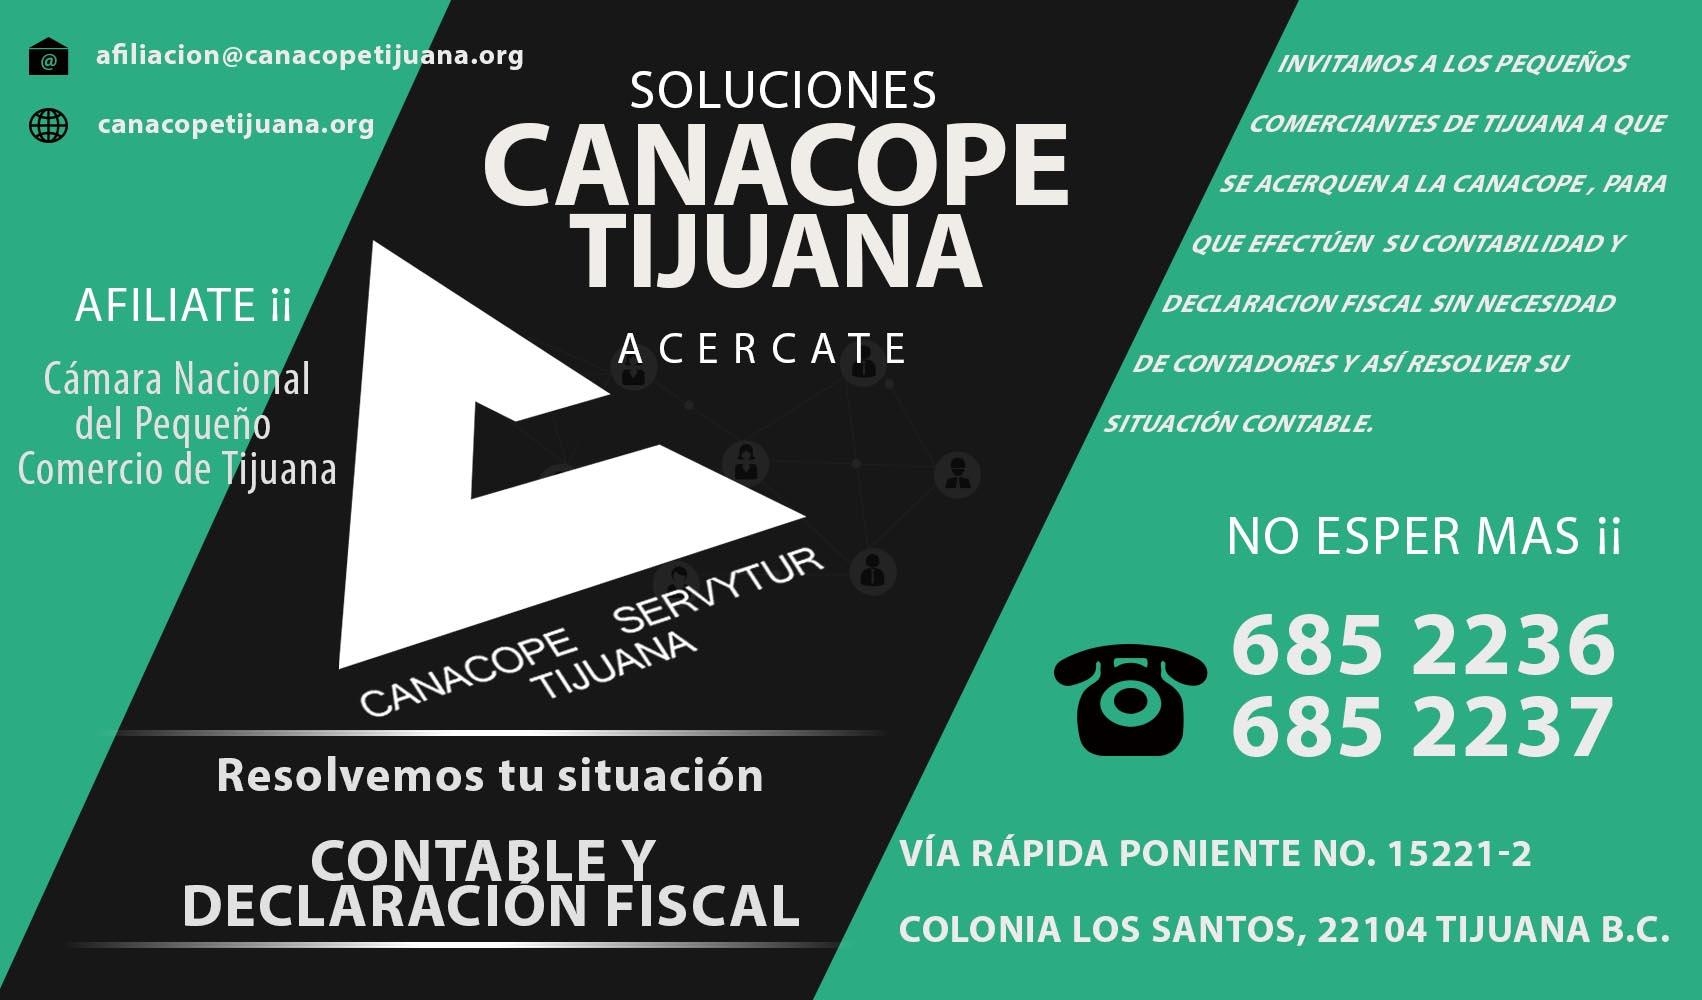 Canacope Tijuana -Cámara del Pequeño Comercio de Tijuana Tijuana